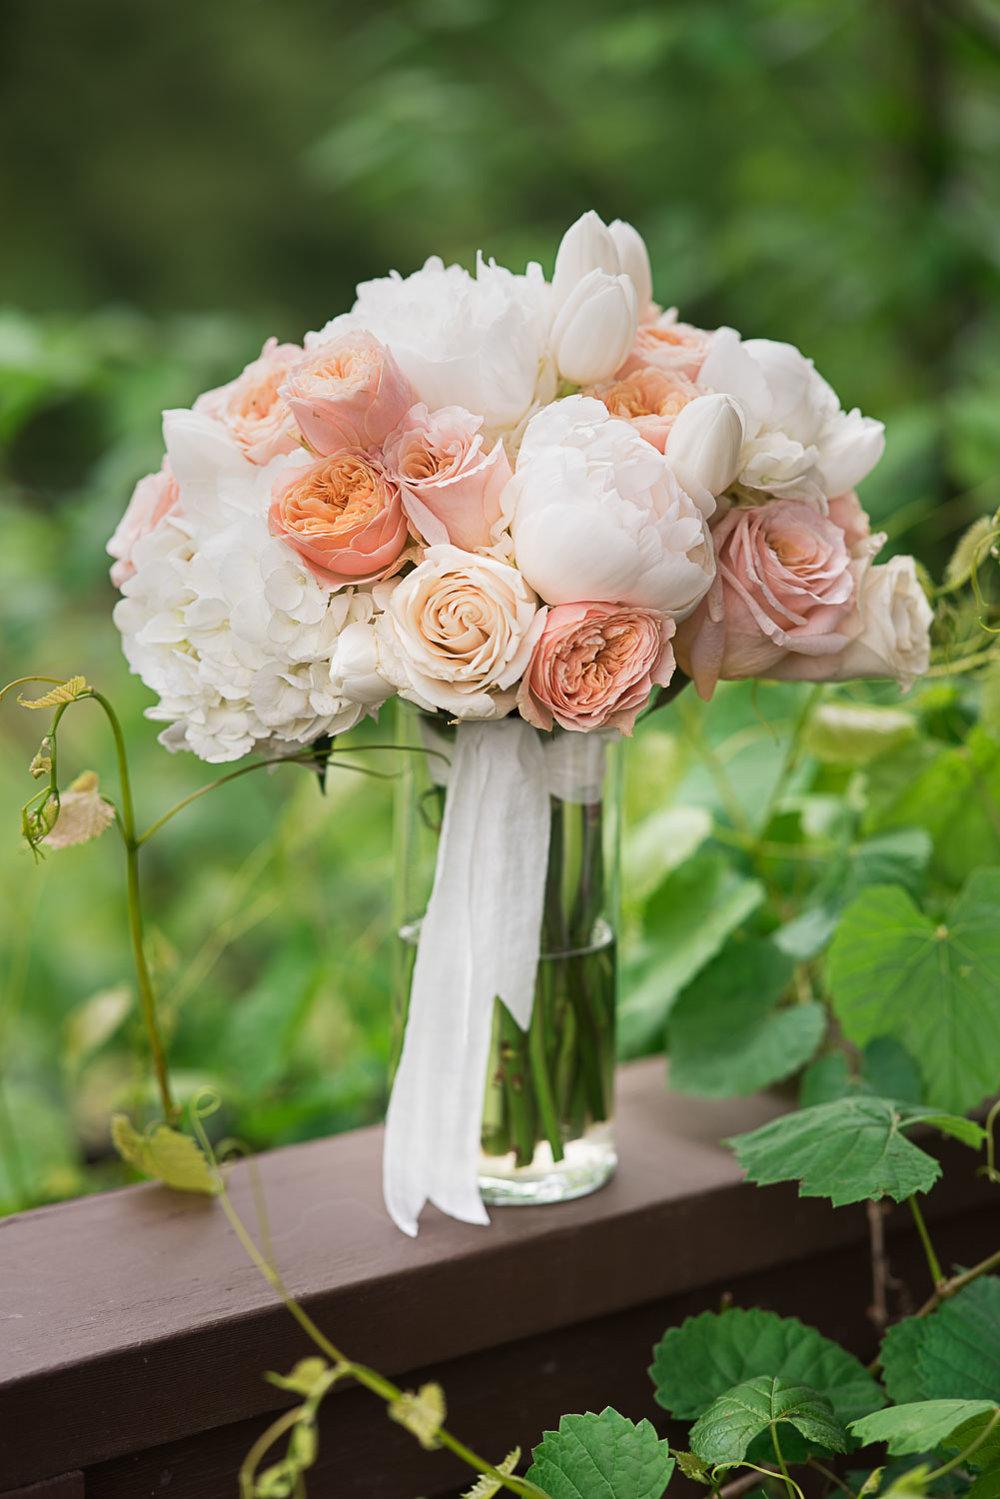 33 Couture Wedding Flowers Floral Boquet.jpg